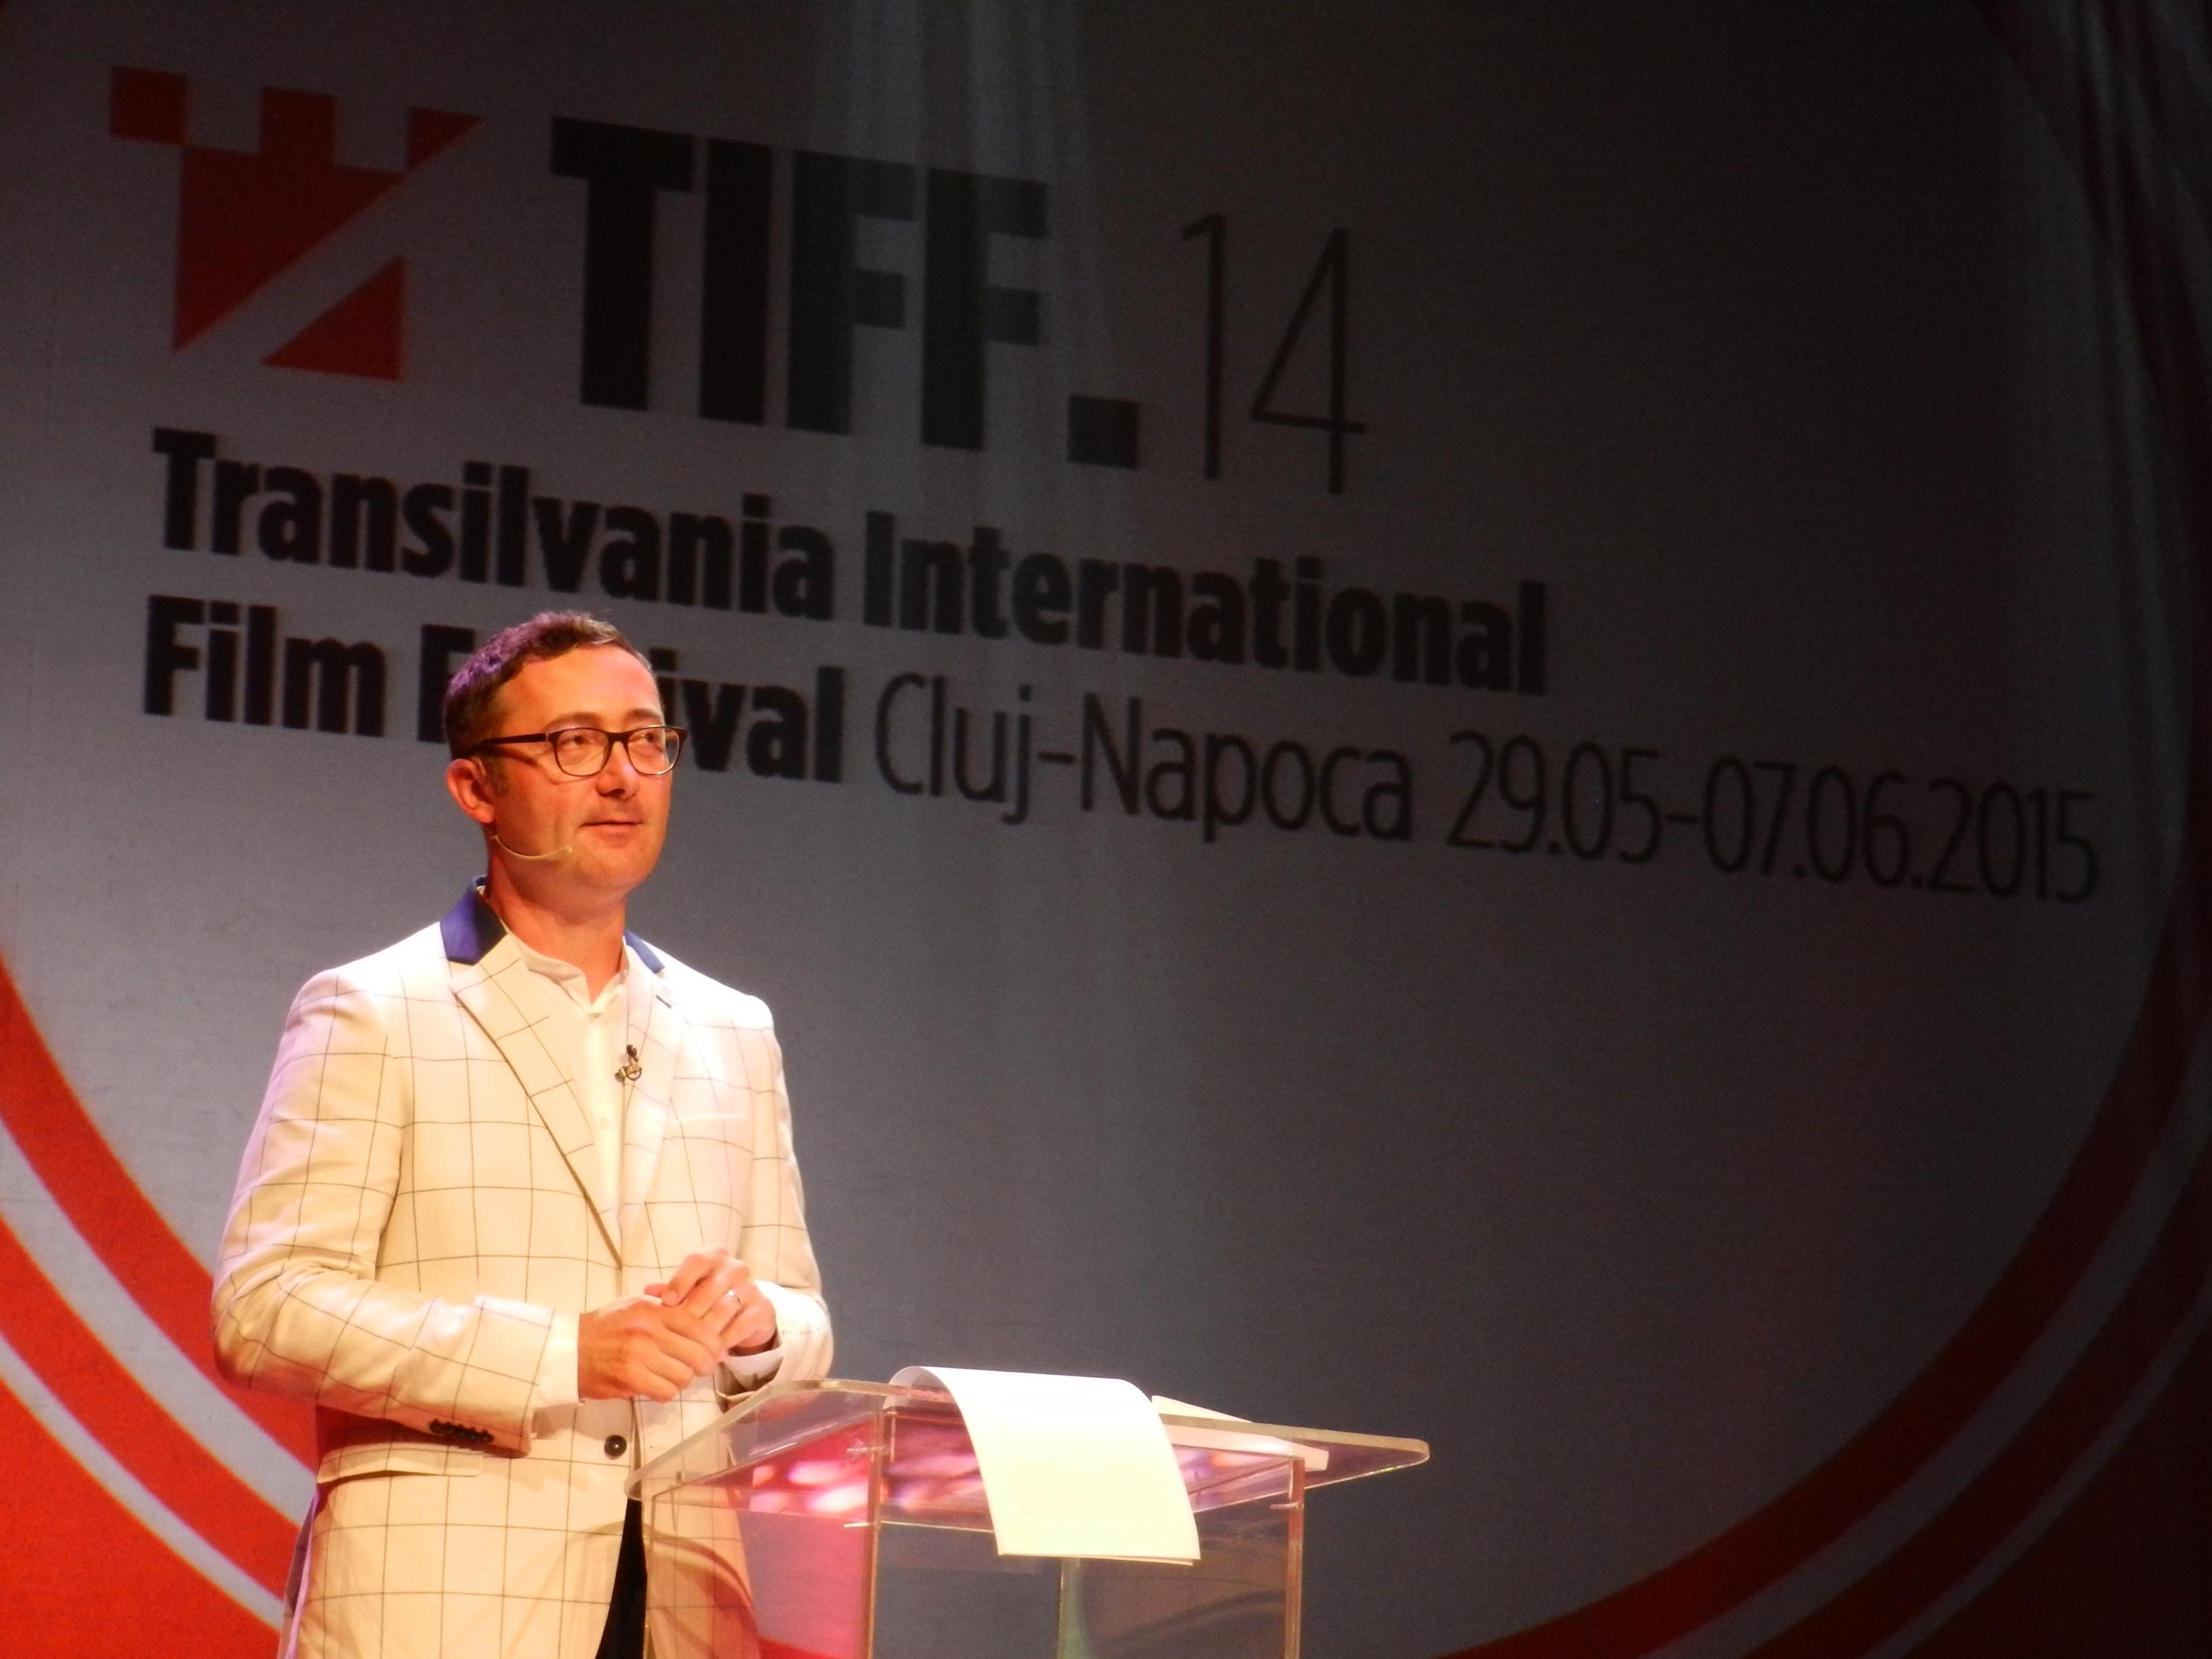 tudor giurgiu, TIFF 2015